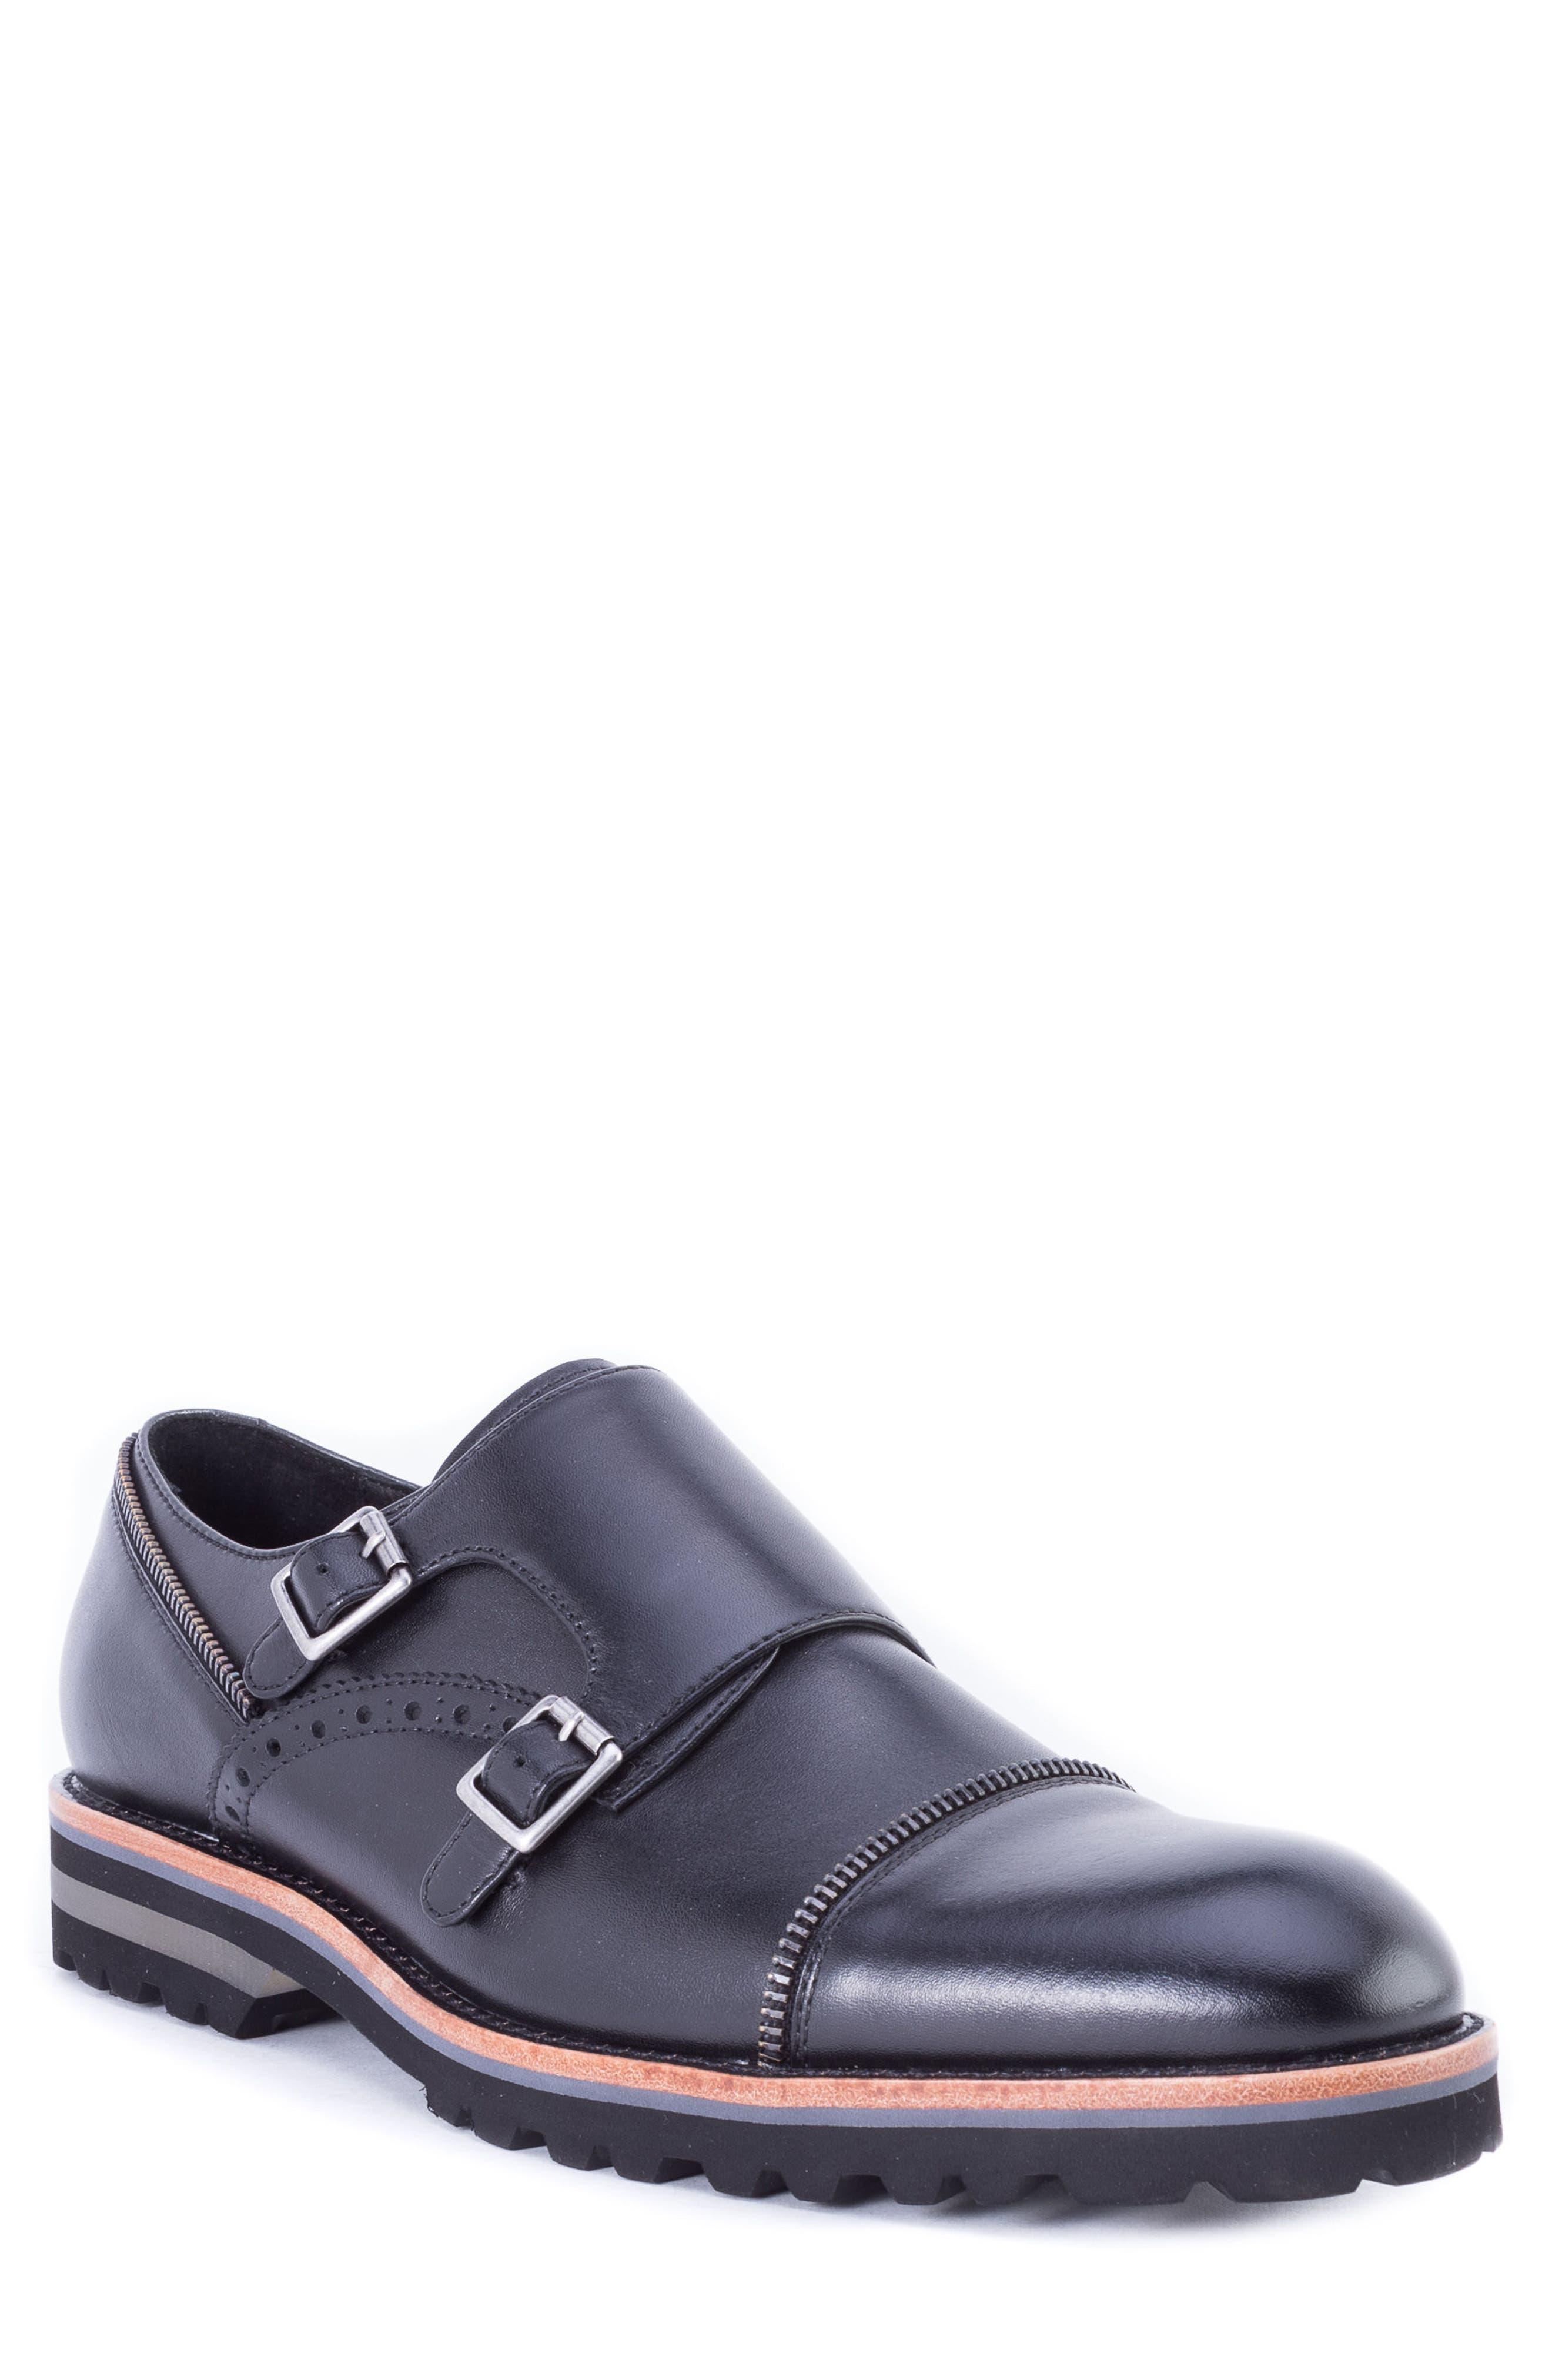 Acadia Double Buckle Monk Shoe,                             Main thumbnail 1, color,                             BLACK LEATHER